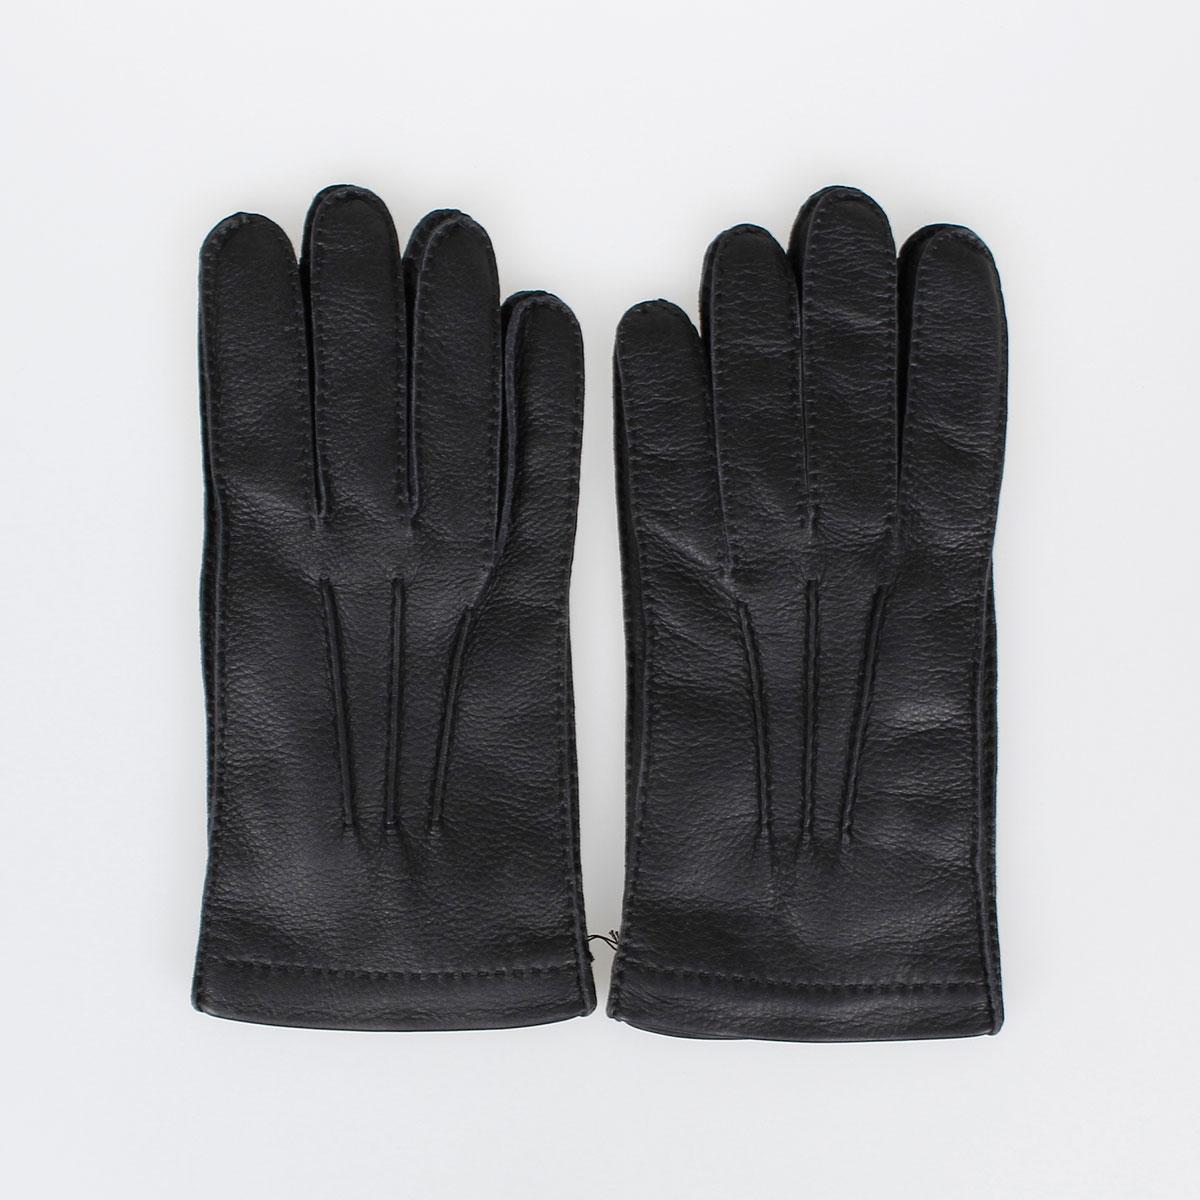 Prada Mens Leather Gloves - Deer skin leather gloves